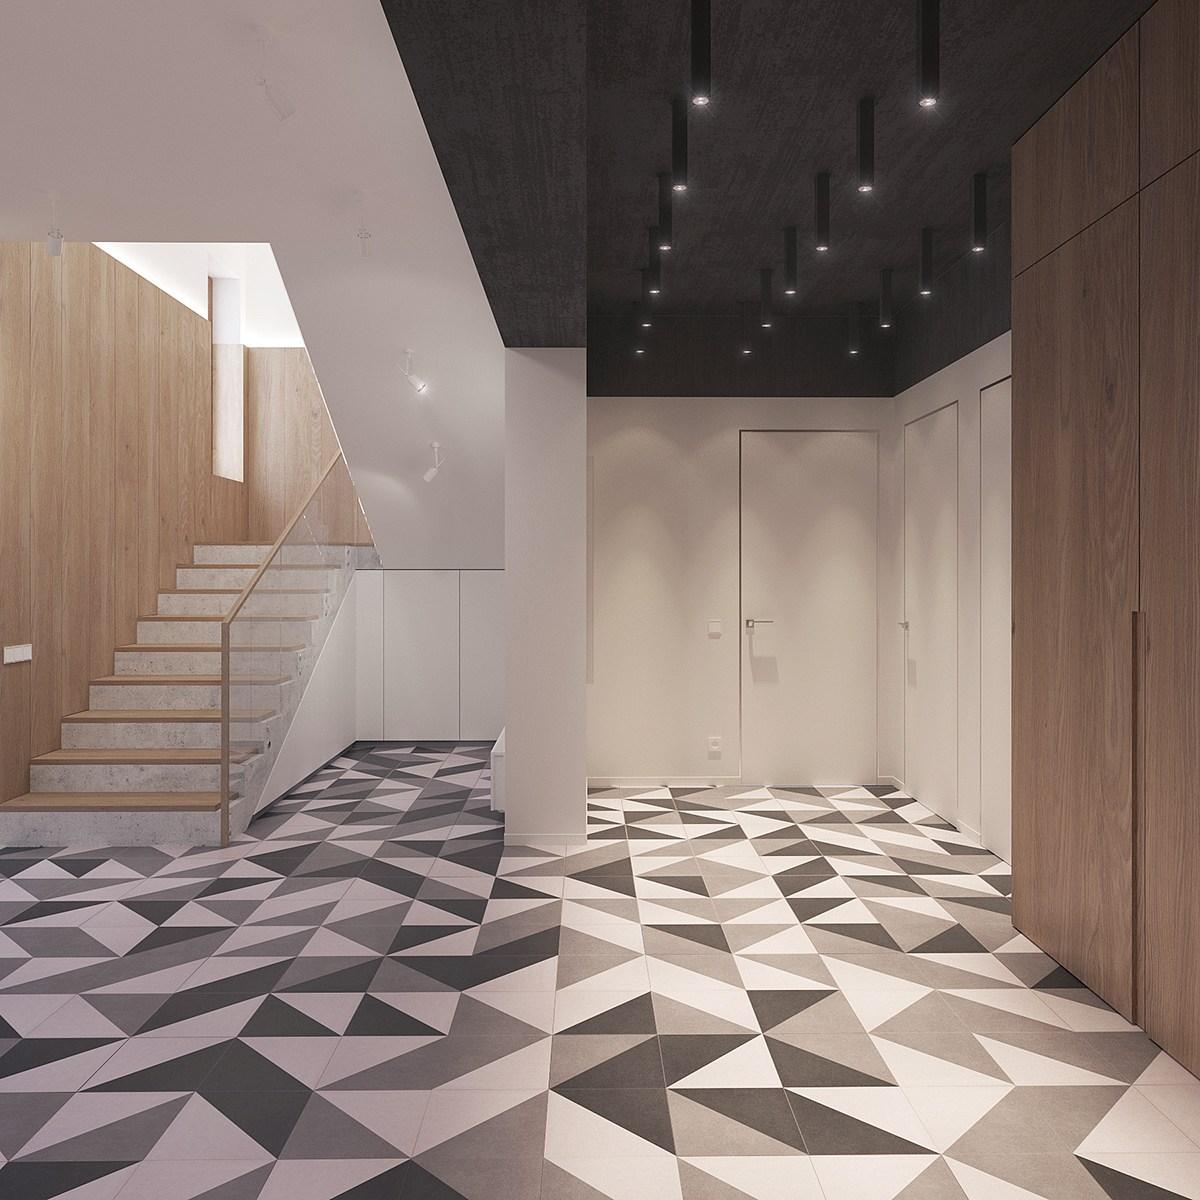 Geometric Floor Tiles In Greyscale